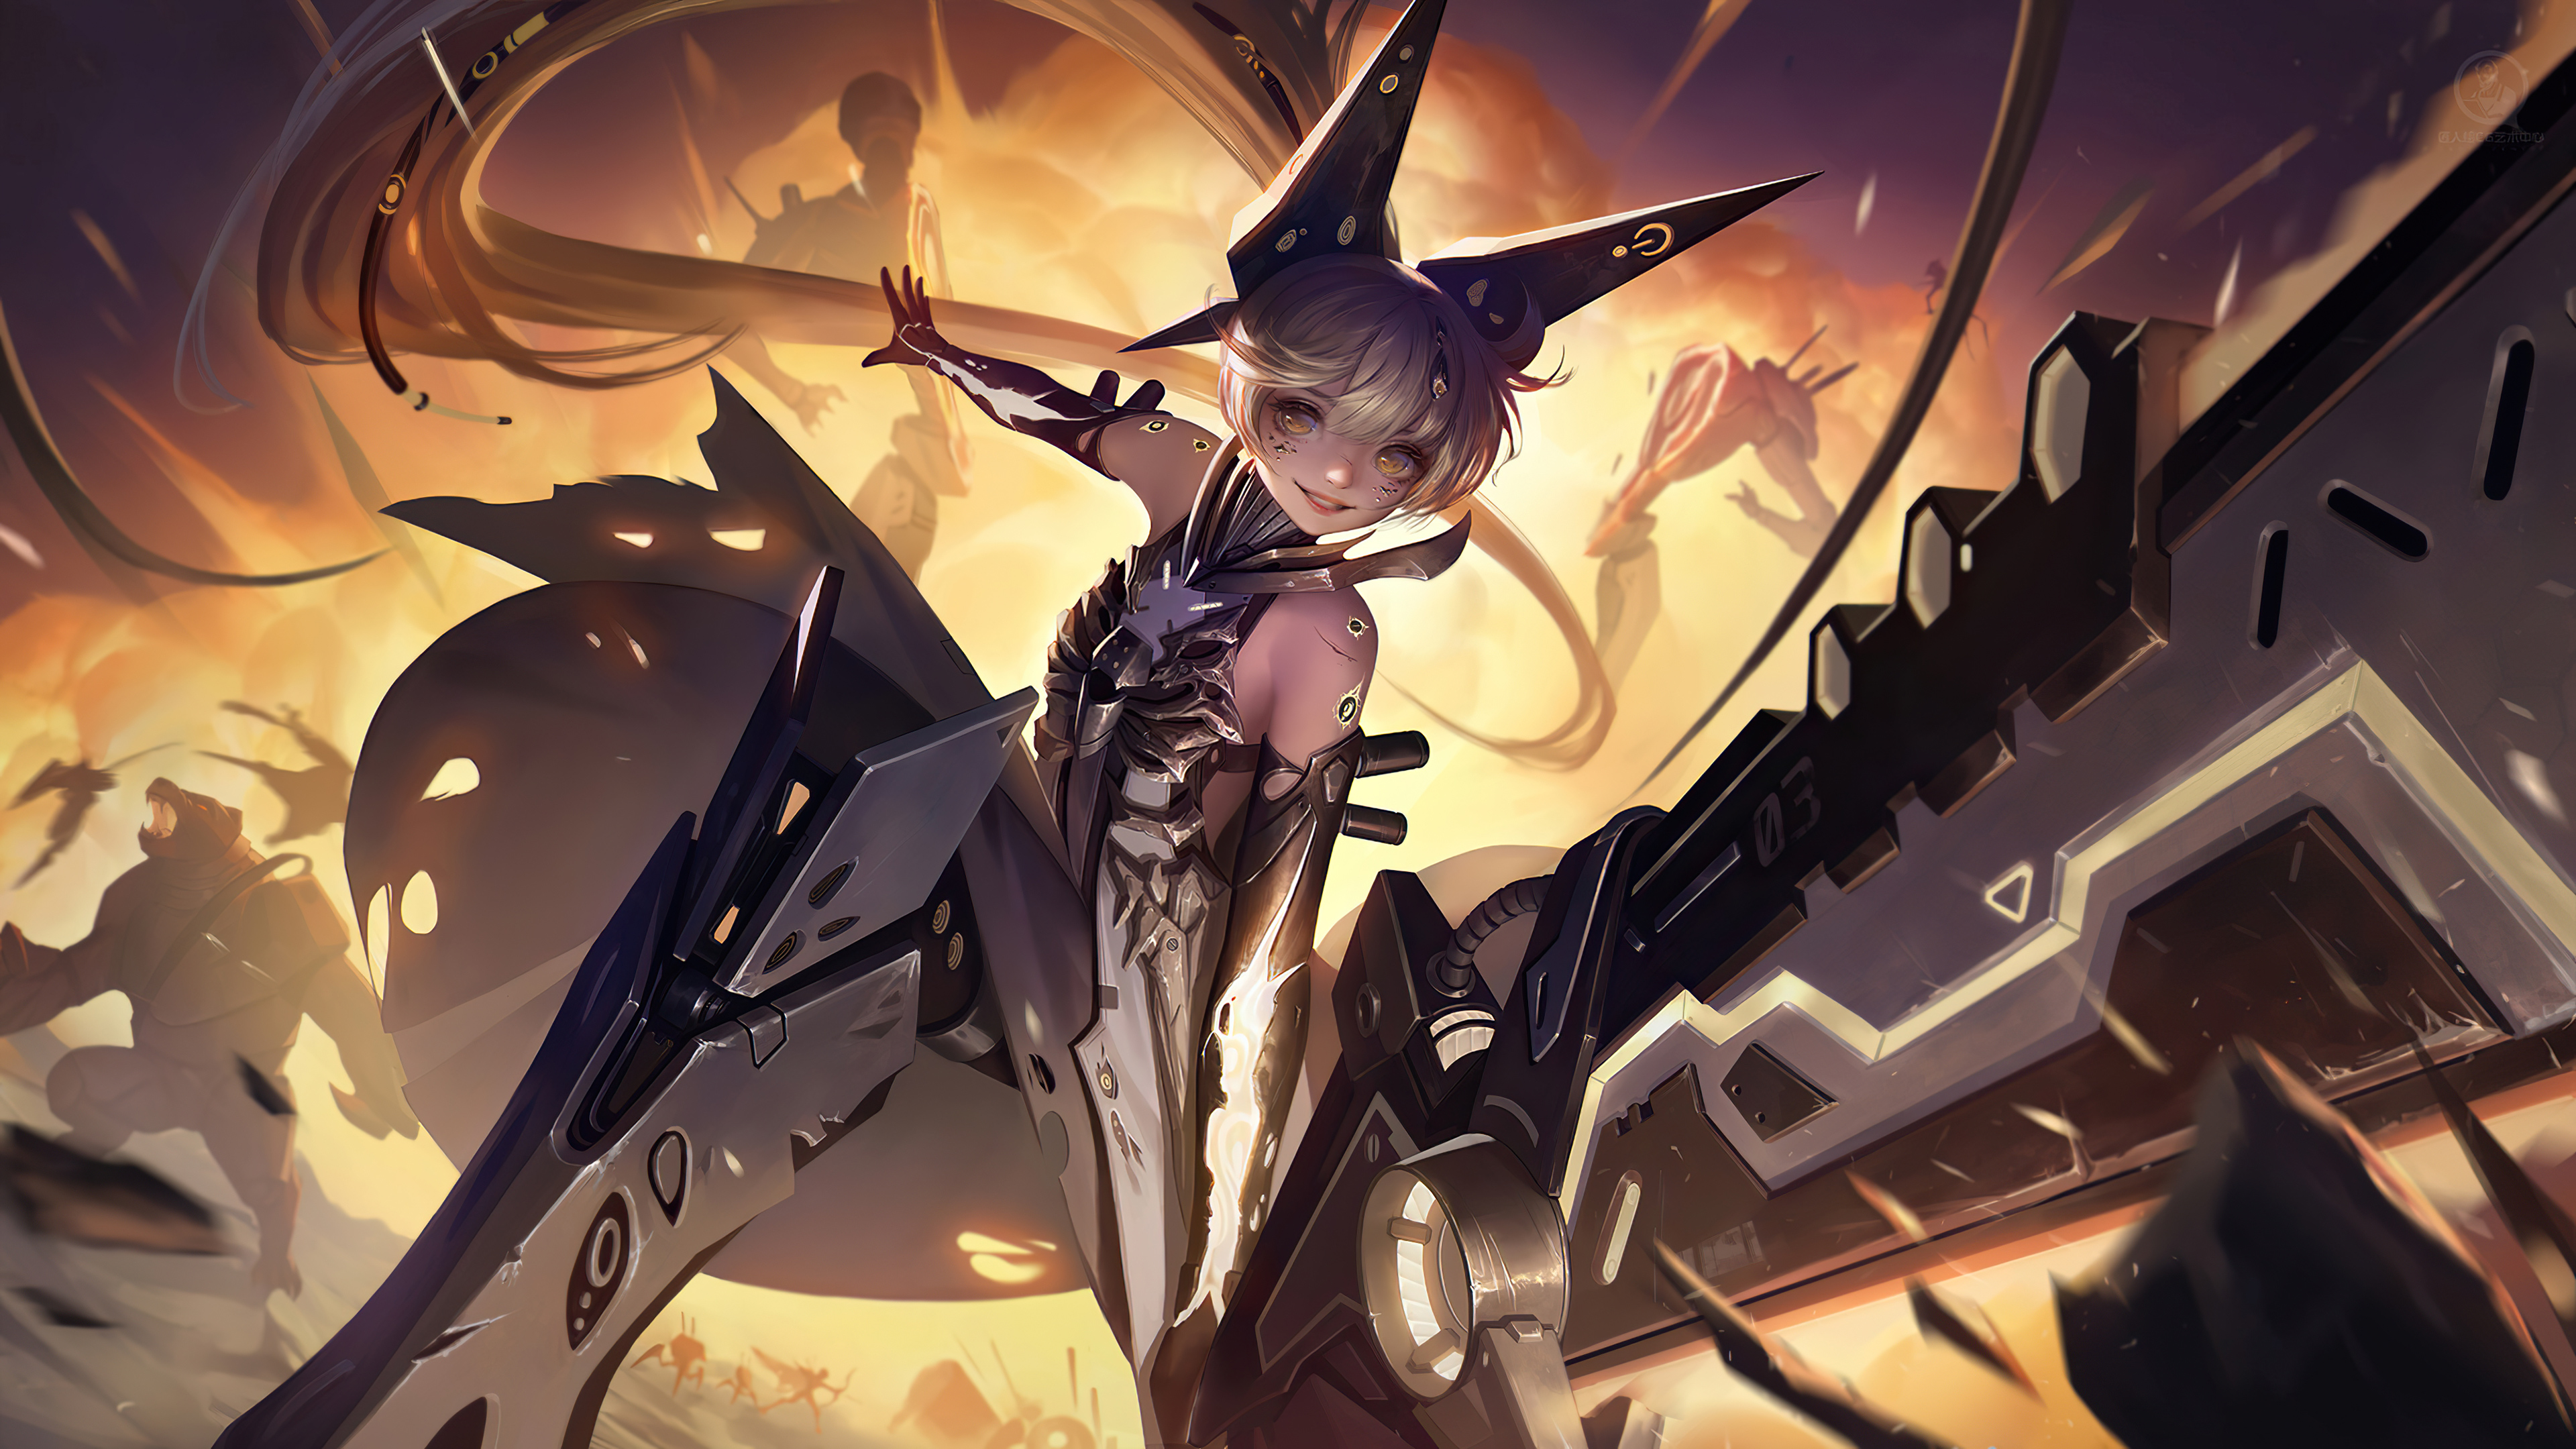 blade girl scifi 4k 1618128215 - Blade Girl Scifi 4k - Blade Girl Scifi 4k wallpapers